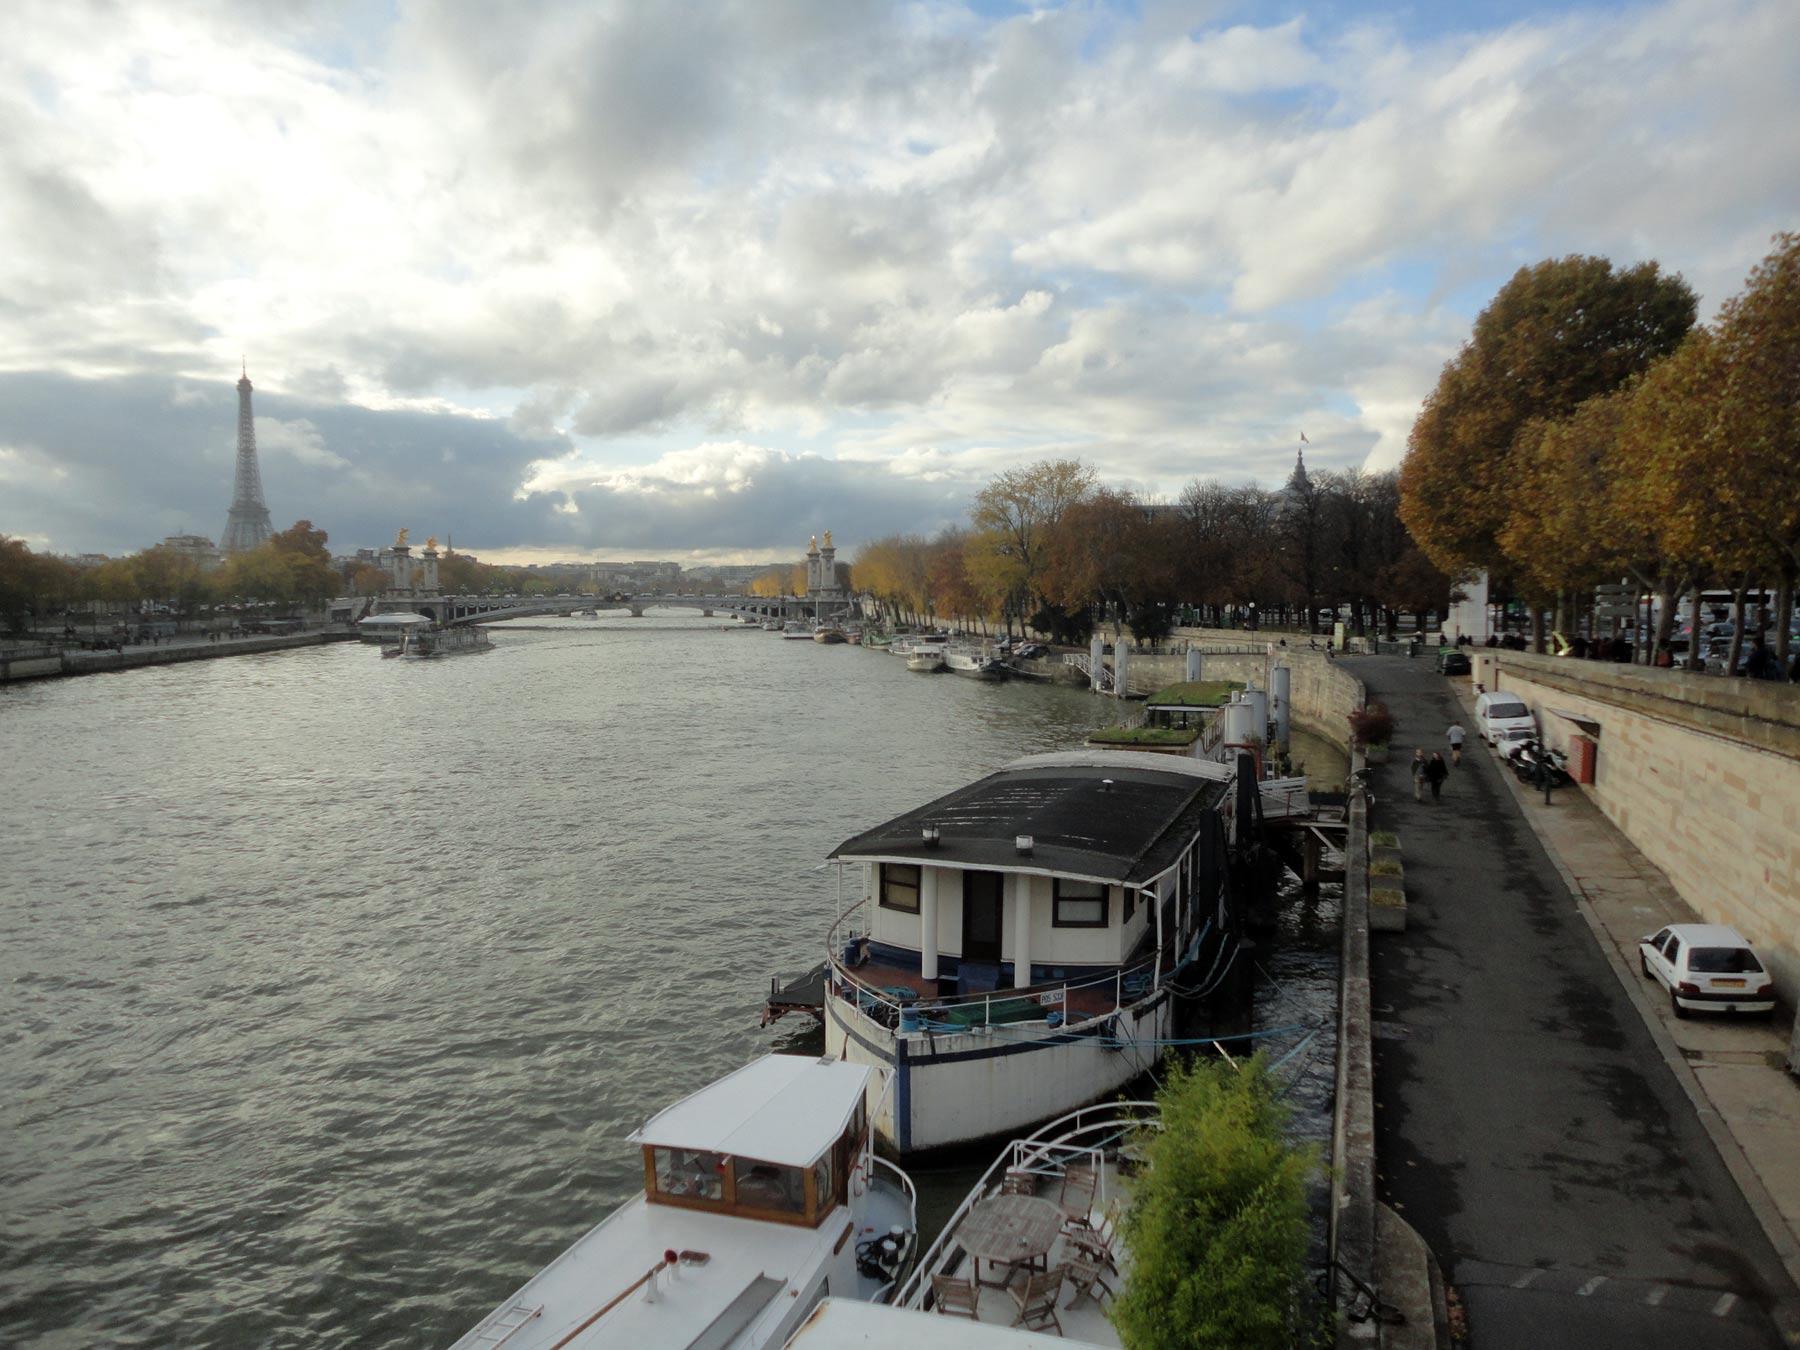 экскурсия по мосту Конкорд Париж